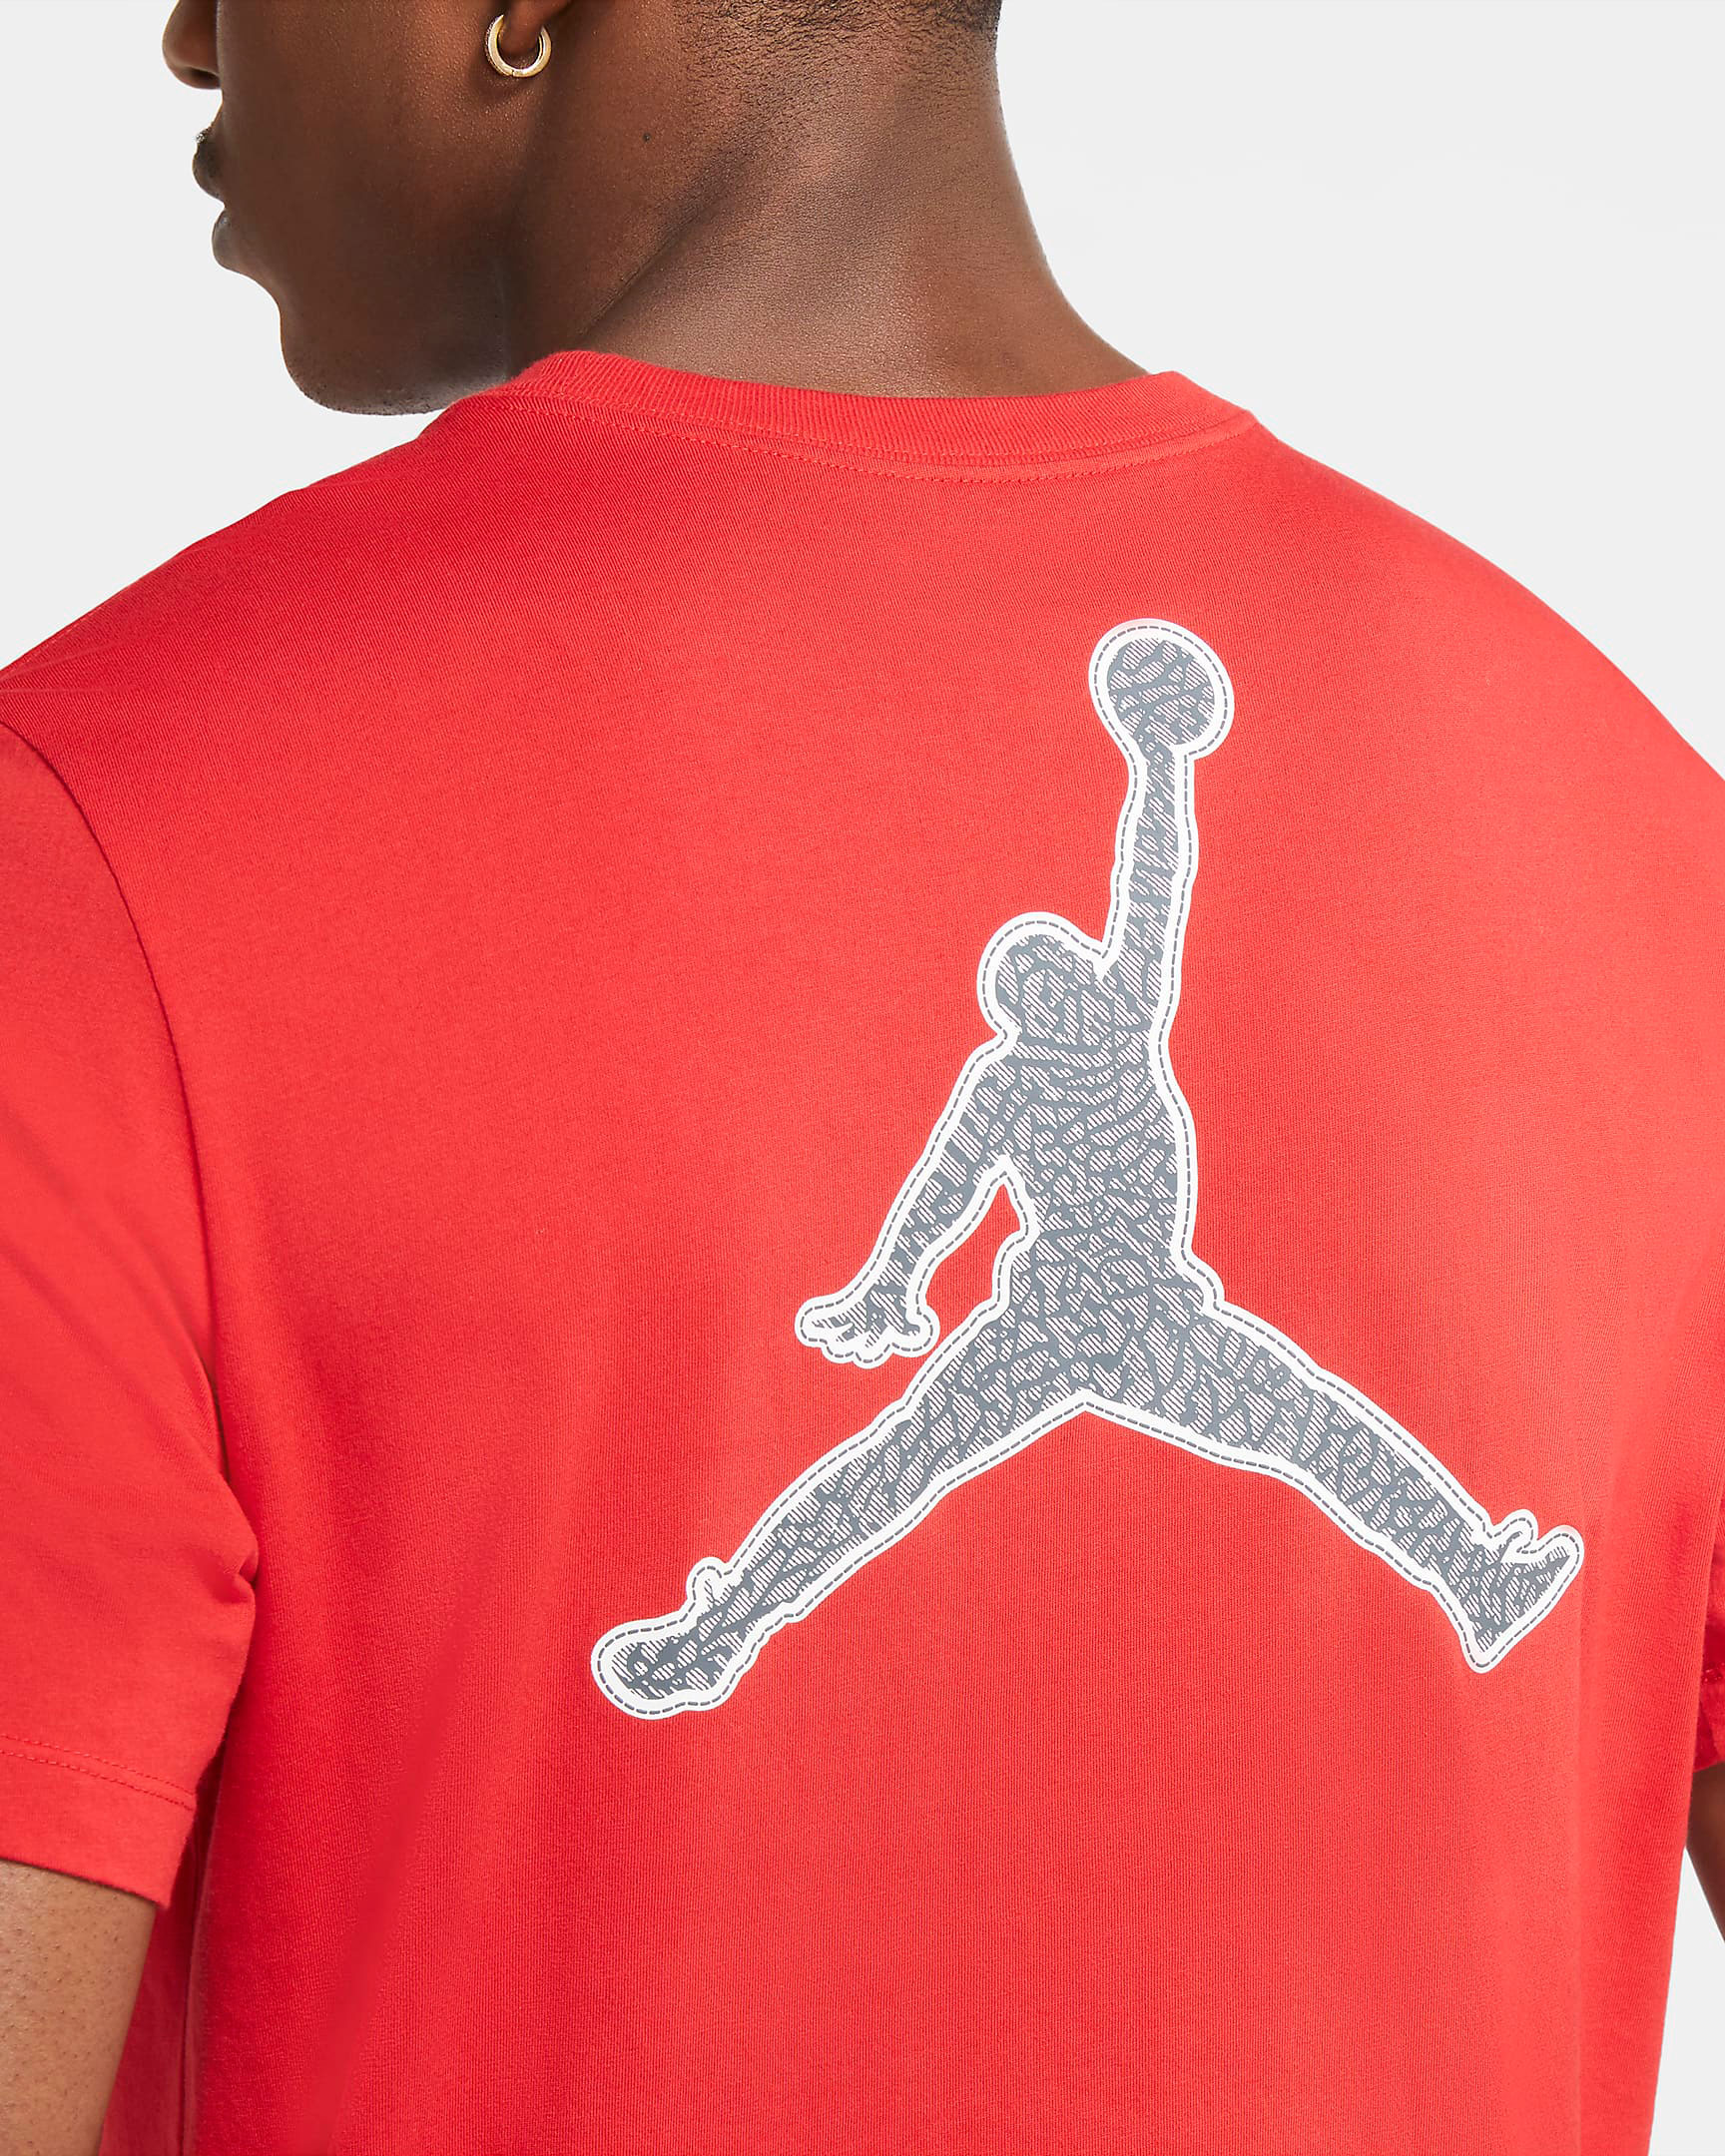 jordan-3-denim-fire-red-tee-shirt-2